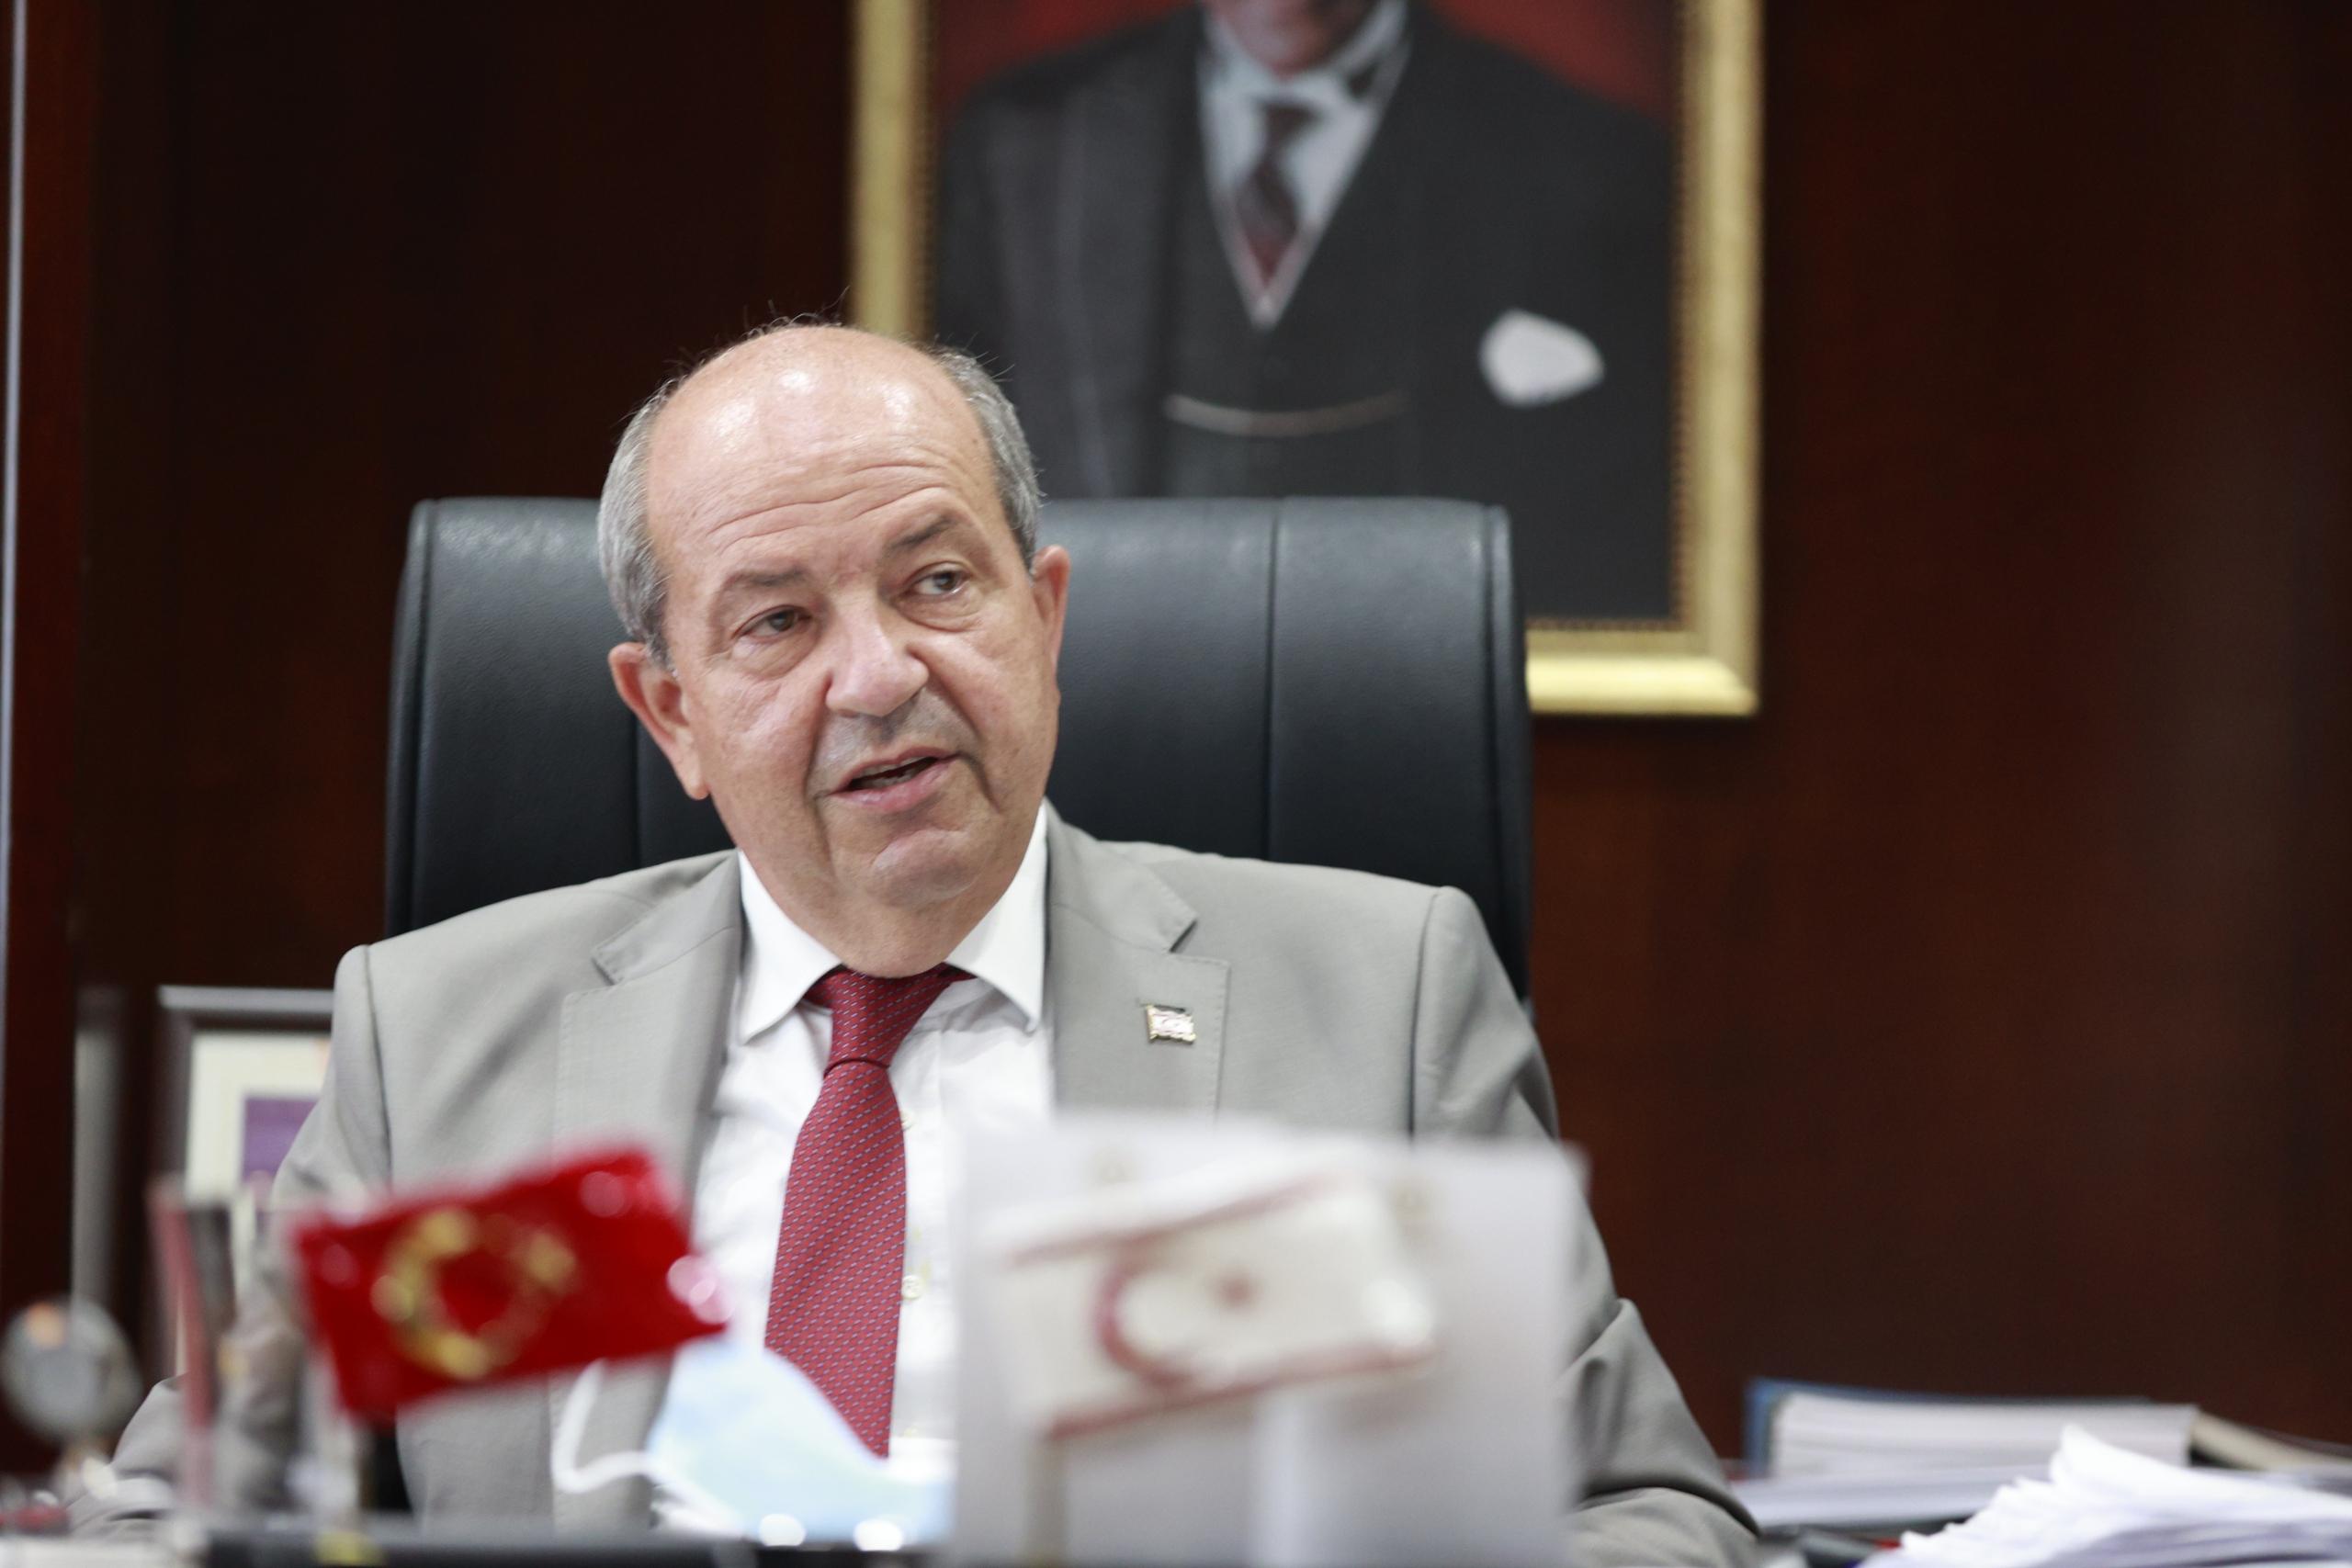 Cumhurbaşkanı Tatar'dan halka aşı olun çağrısı